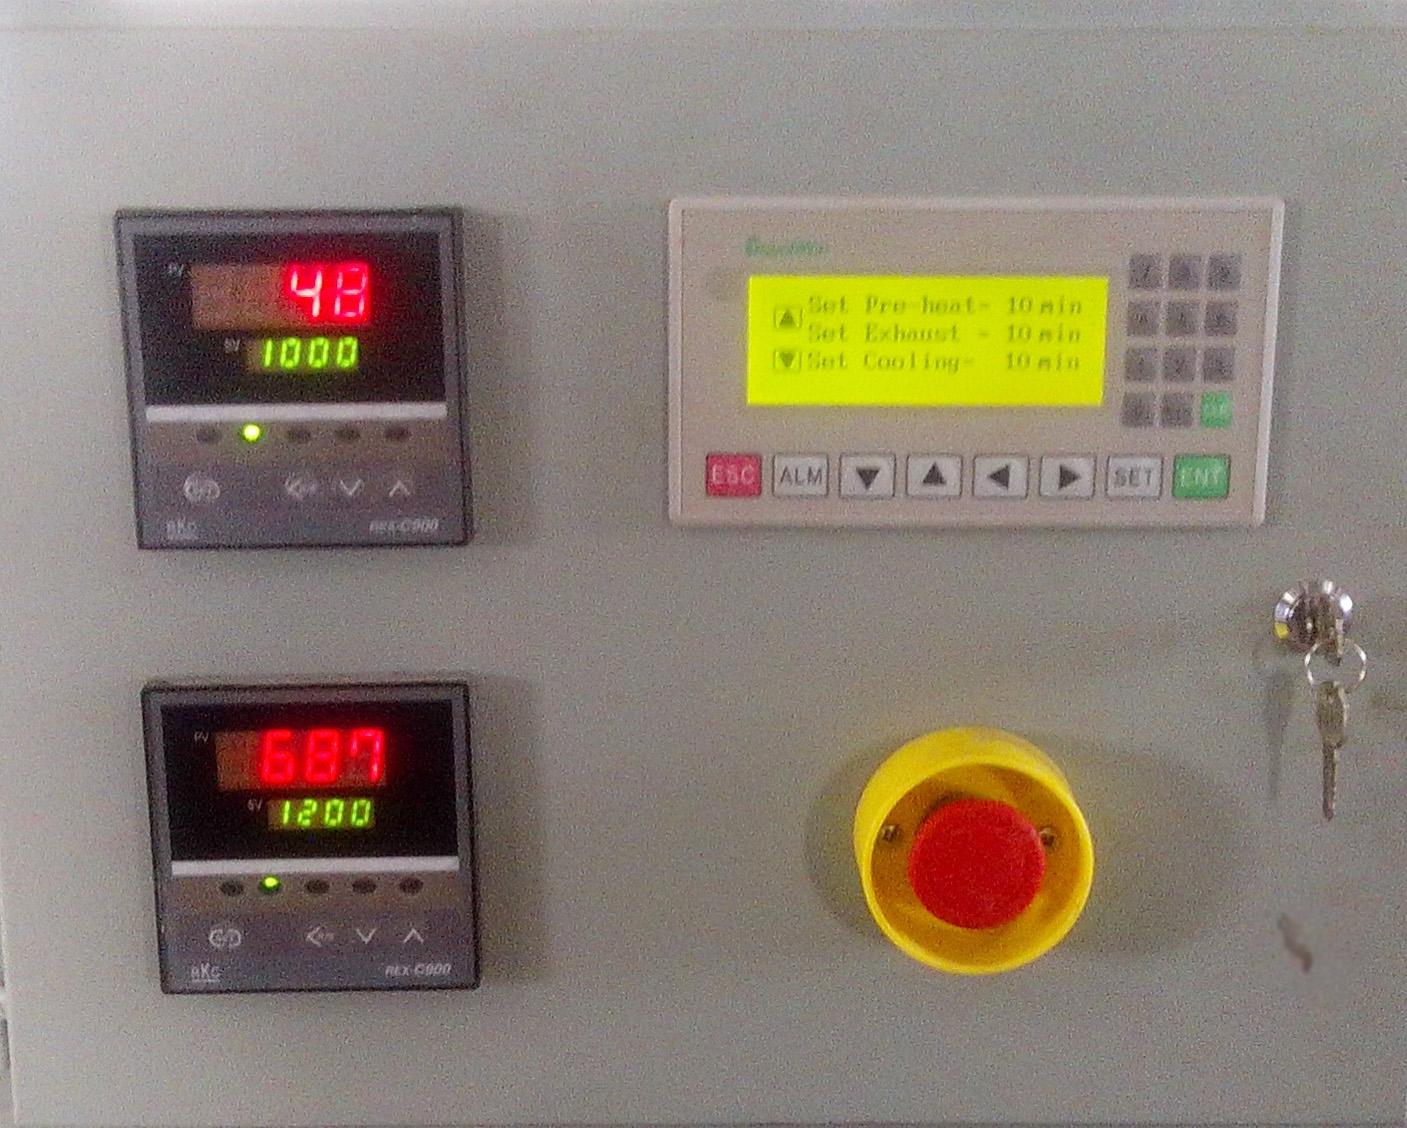 clover incinerator yd 10 price, clover incinerator ltd